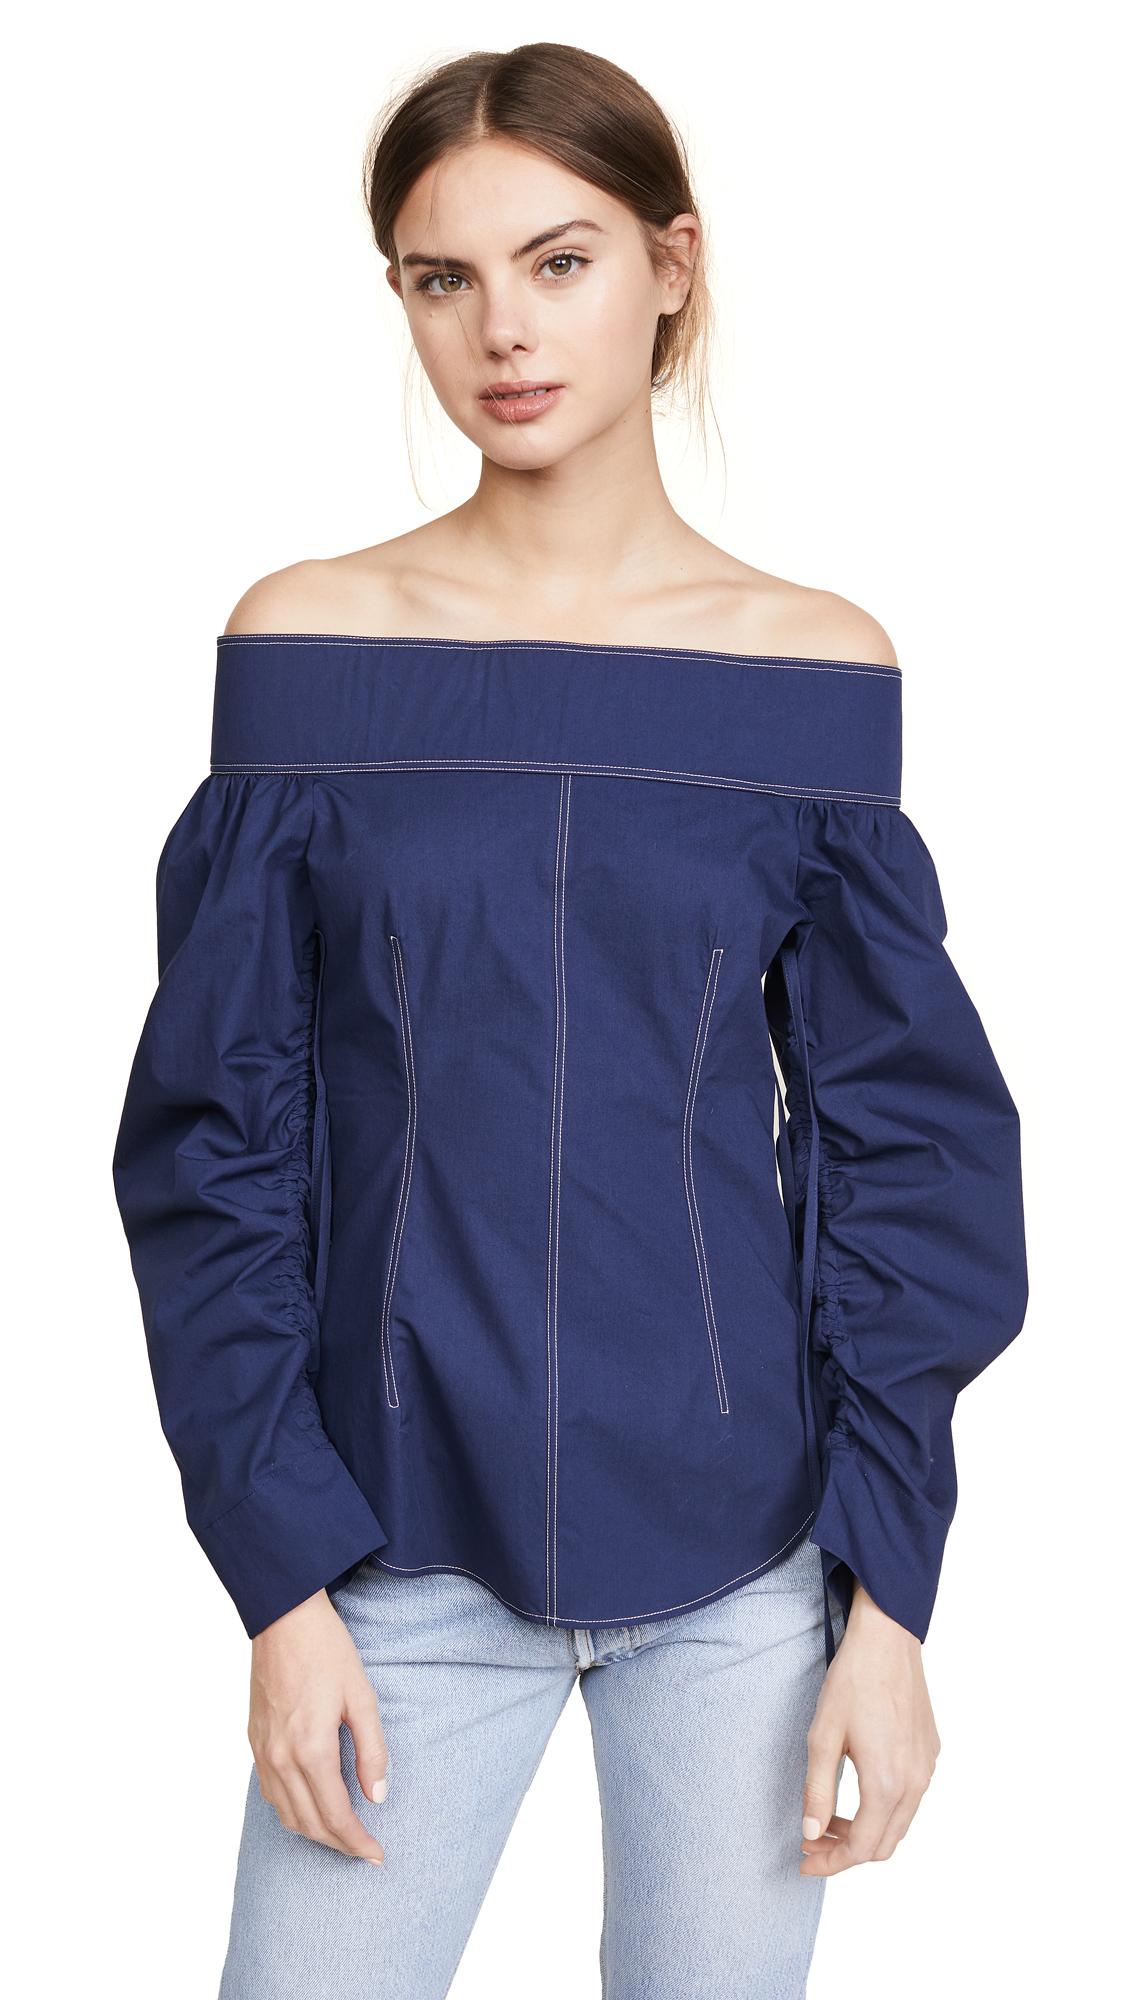 Cedric Charlier Shirting Off Shoulder Top - Blue